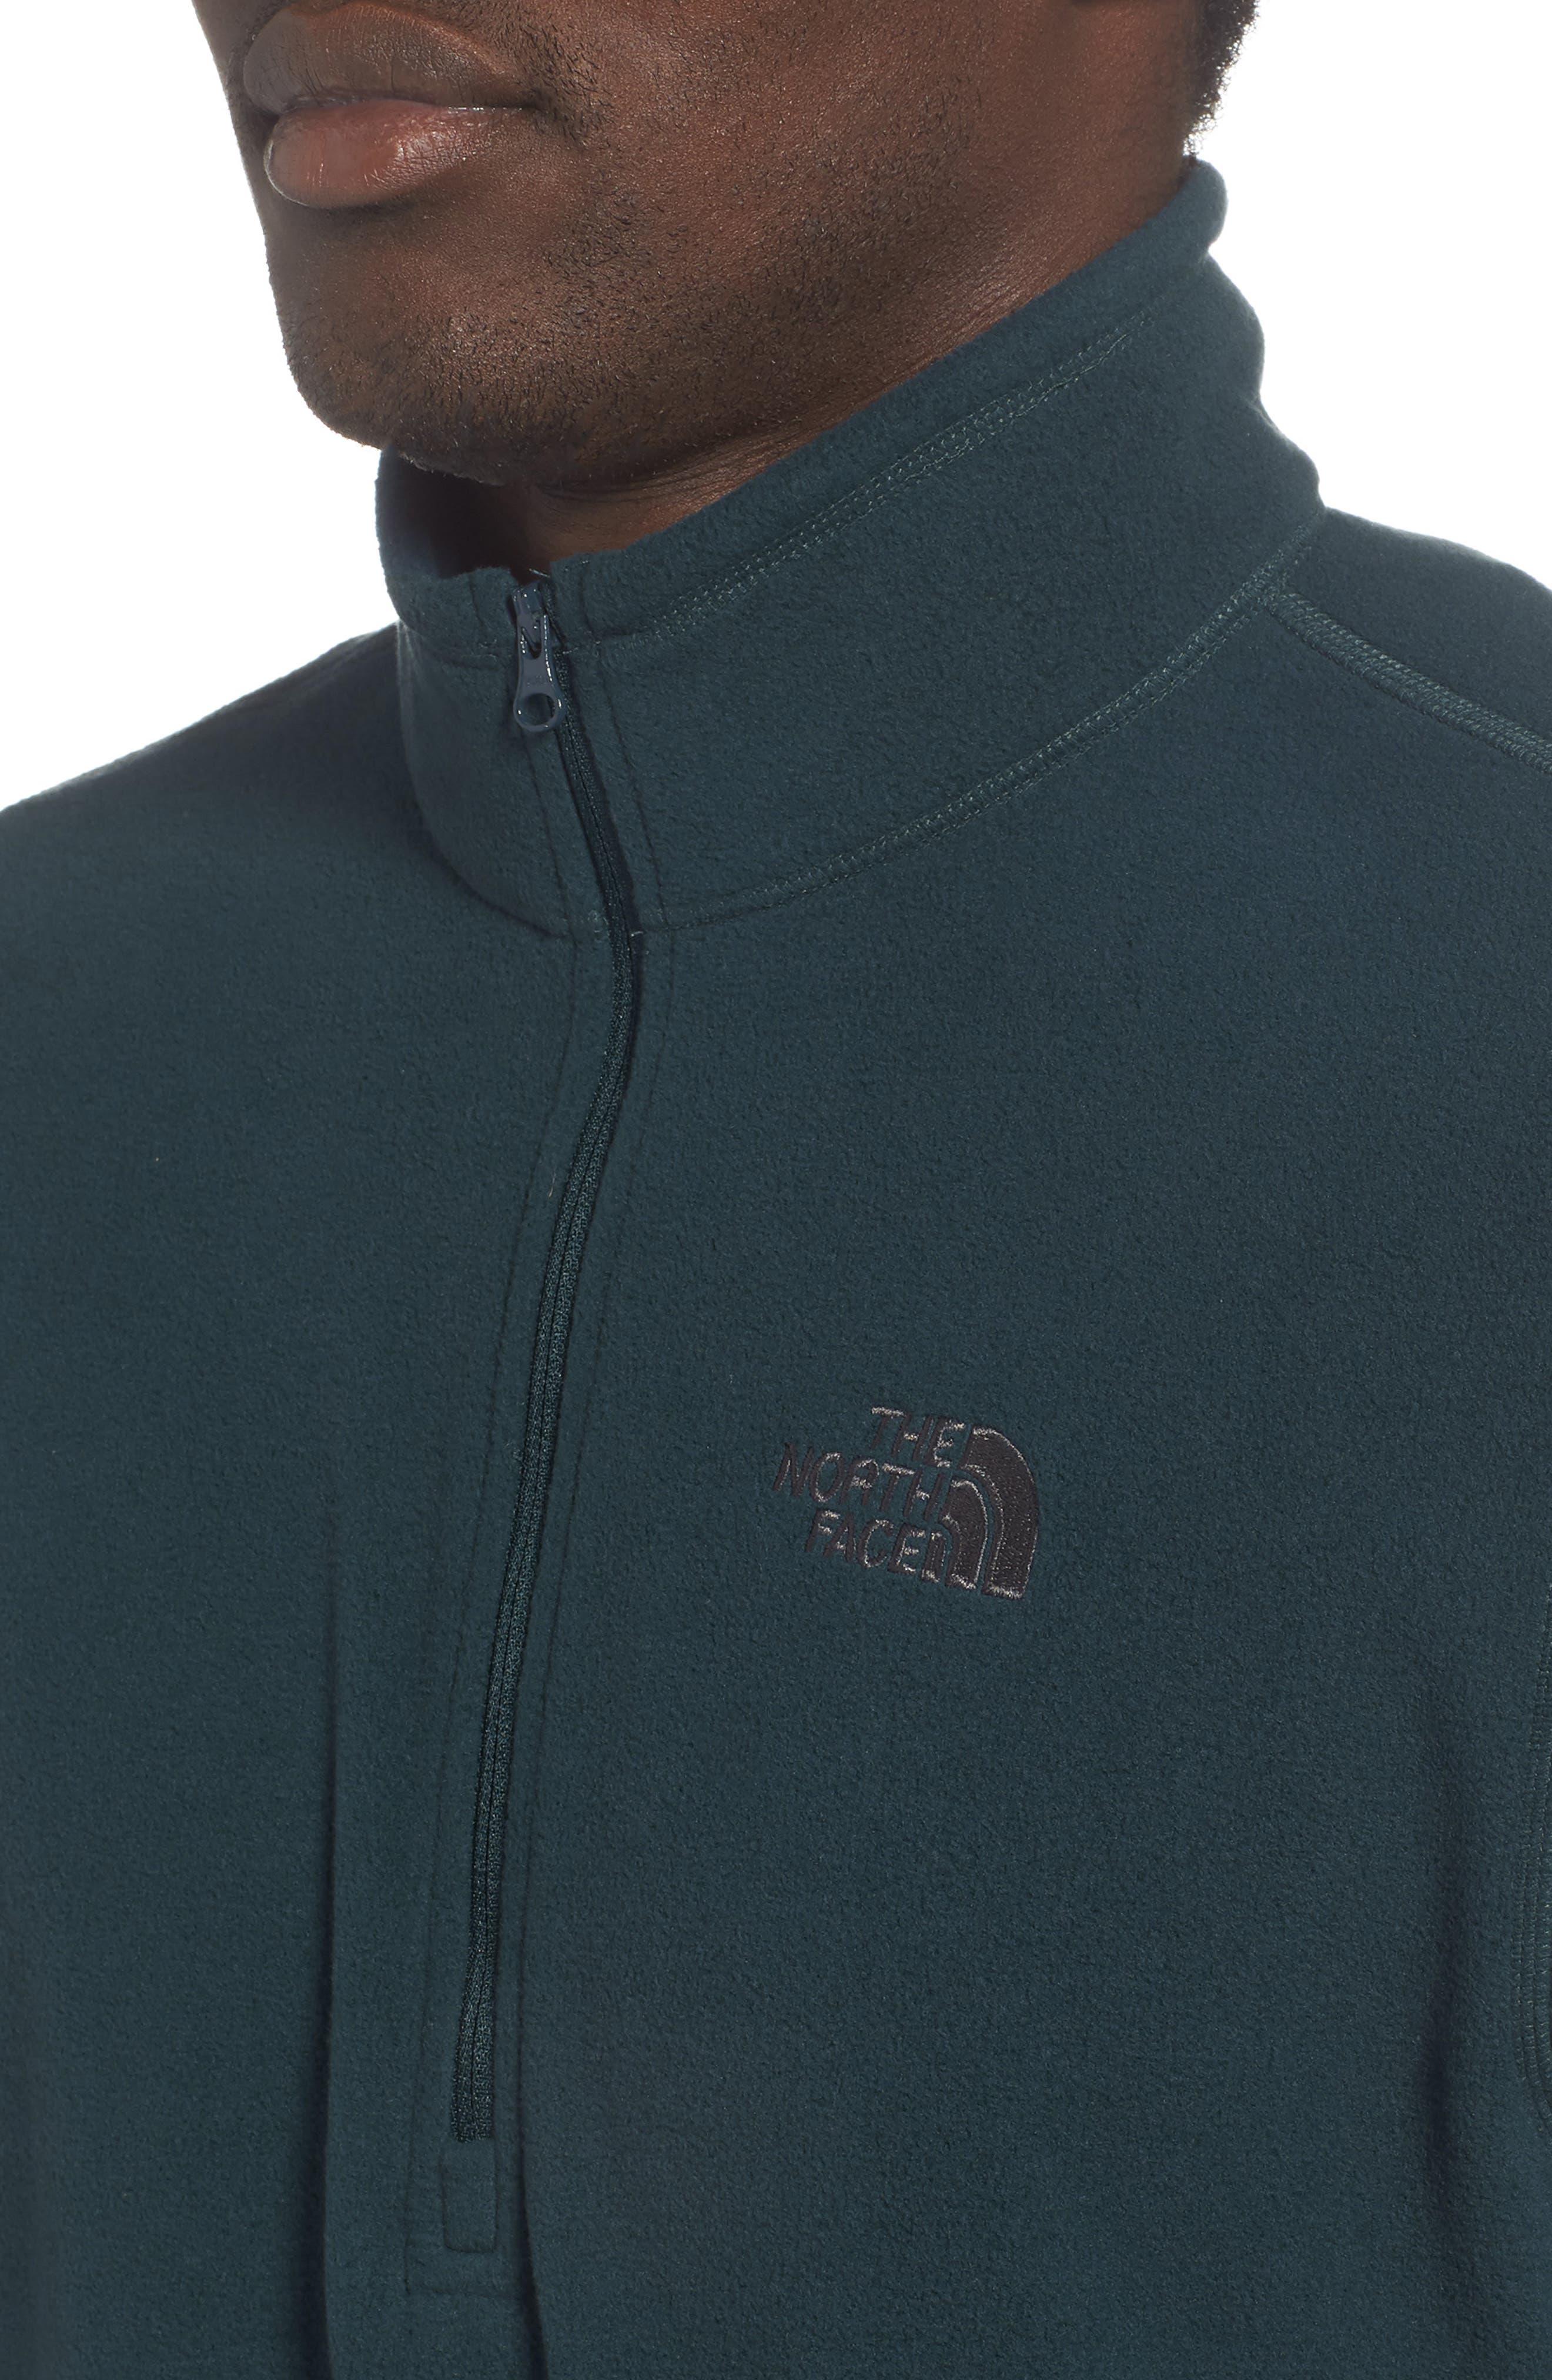 'TKA 100 Glacier' Quarter Zip Fleece Pullover,                             Alternate thumbnail 142, color,